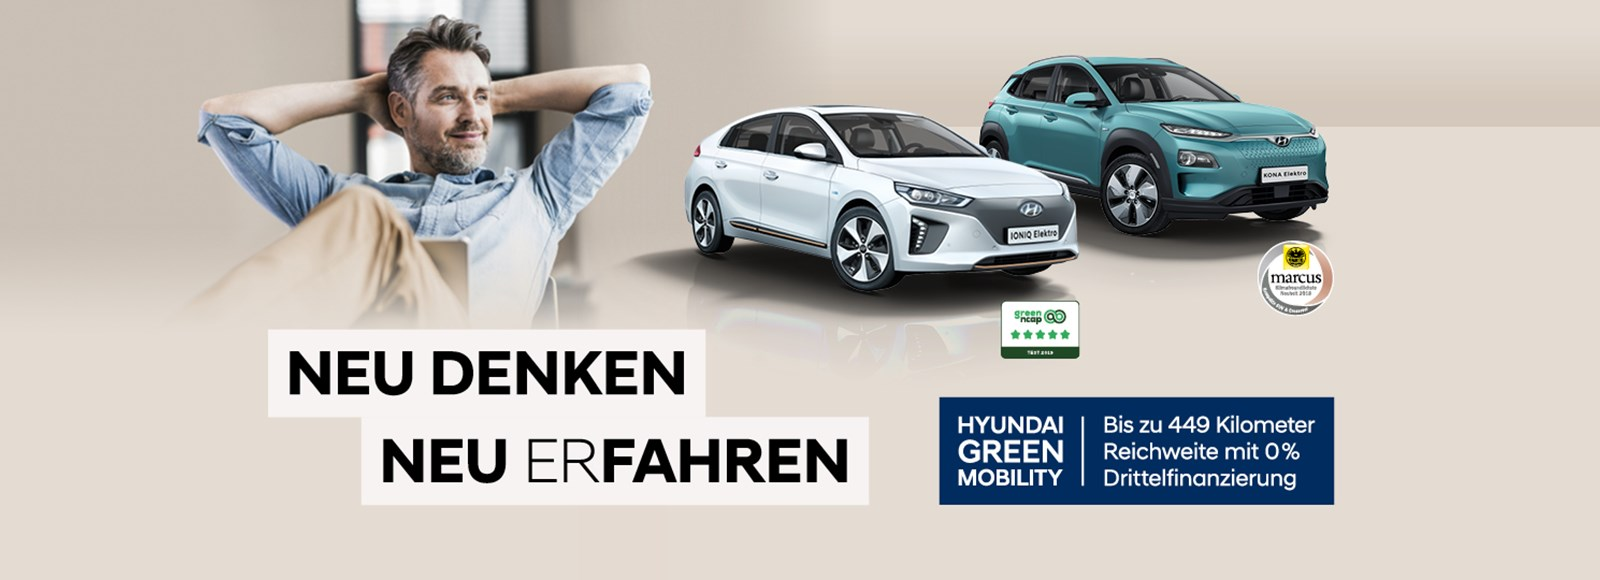 Hyundai-GreenMobility-1800x540px